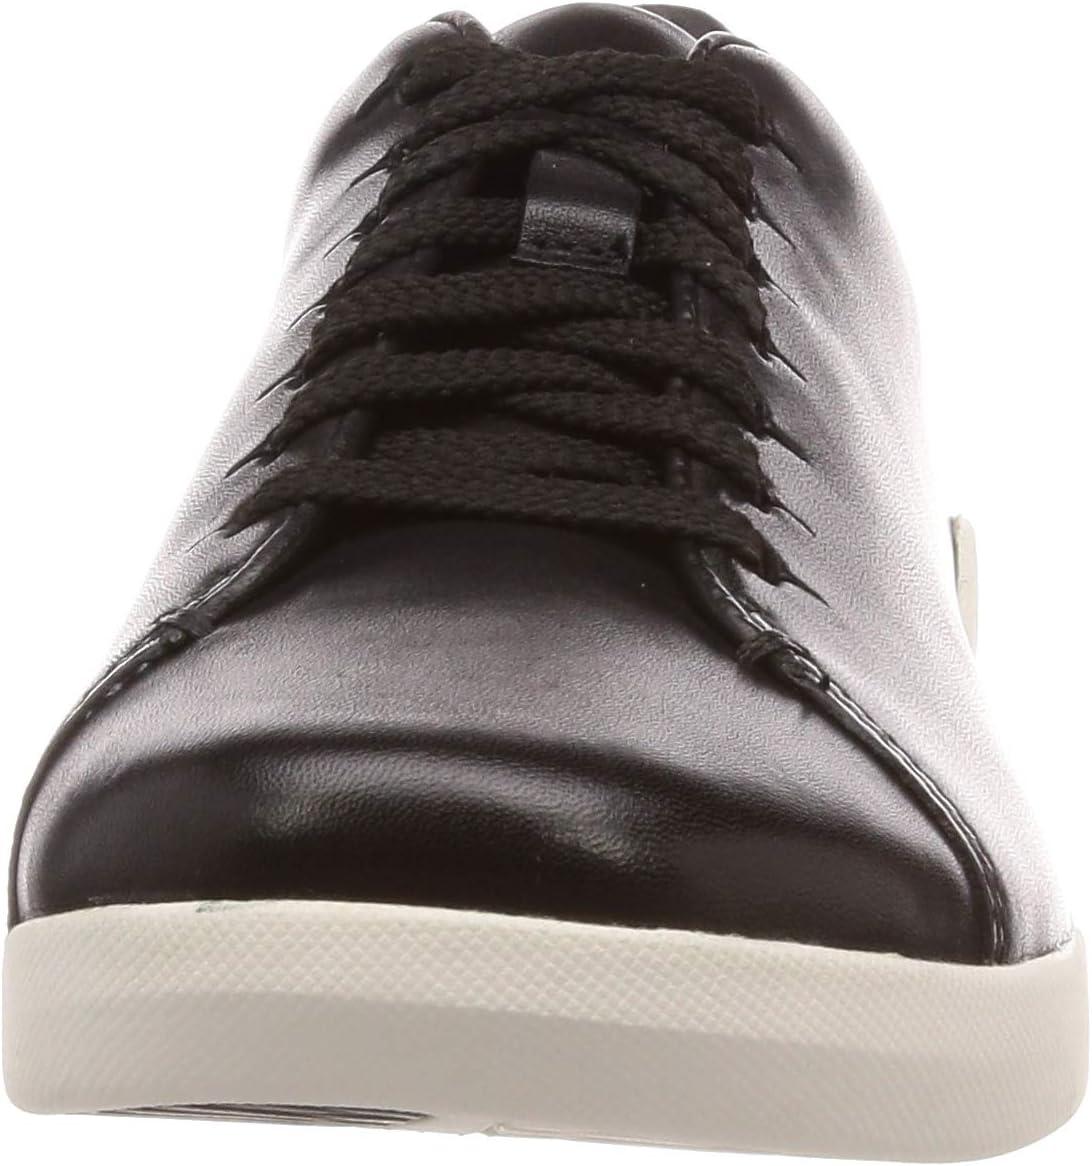 Clarks Dames Tri Abby Low-Top Sneakers zwart (zwart)